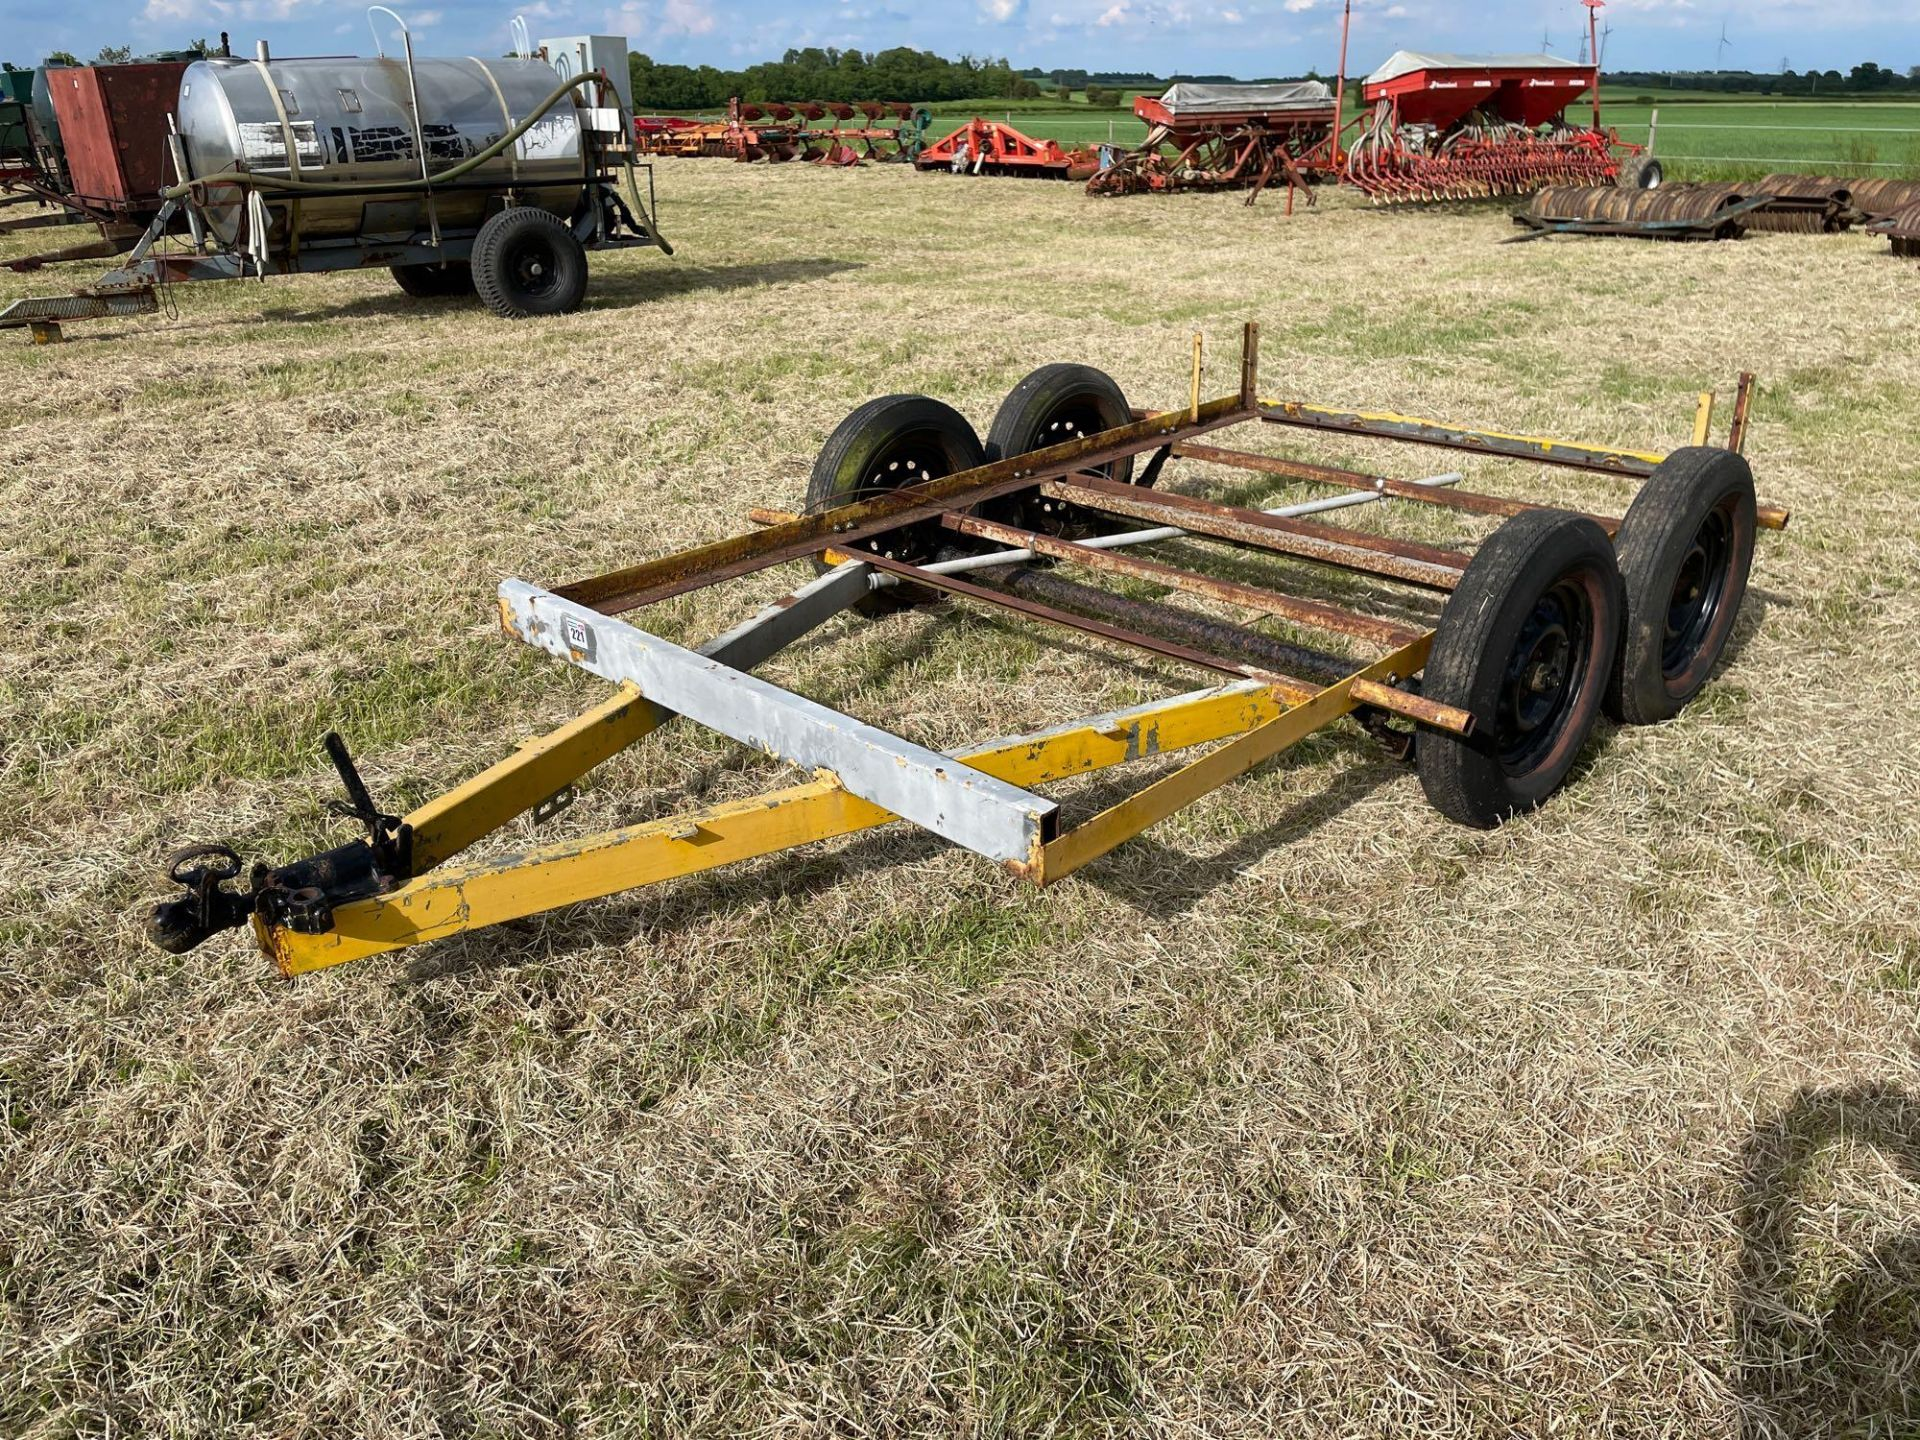 Single axle car trailer frame - Image 2 of 4